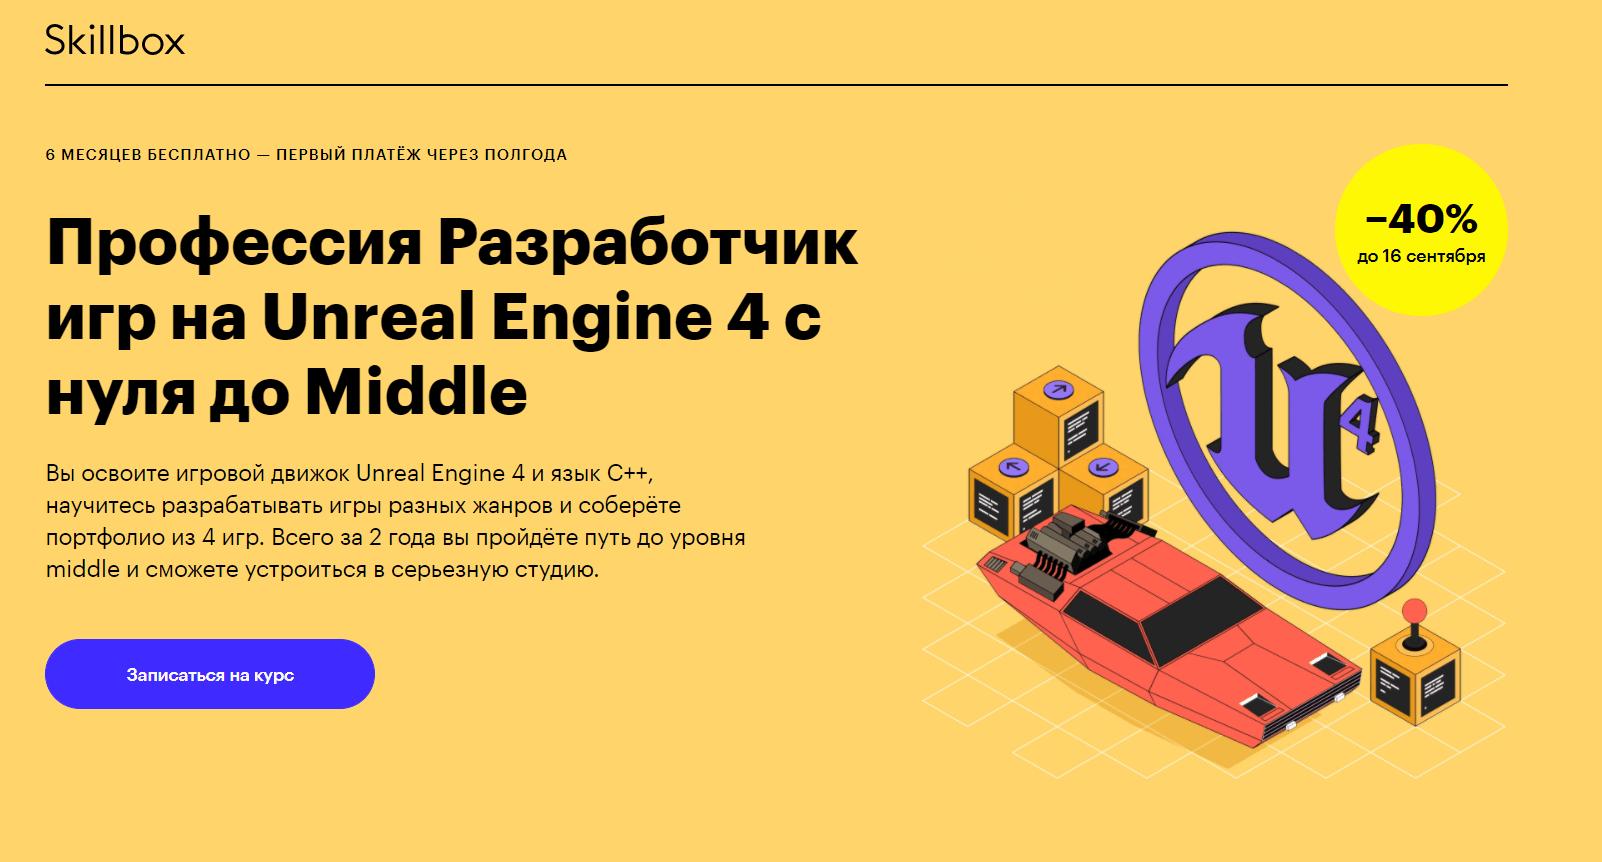 Профессия Разработчик игр на Unreal Engine 4 с нуля до Middle